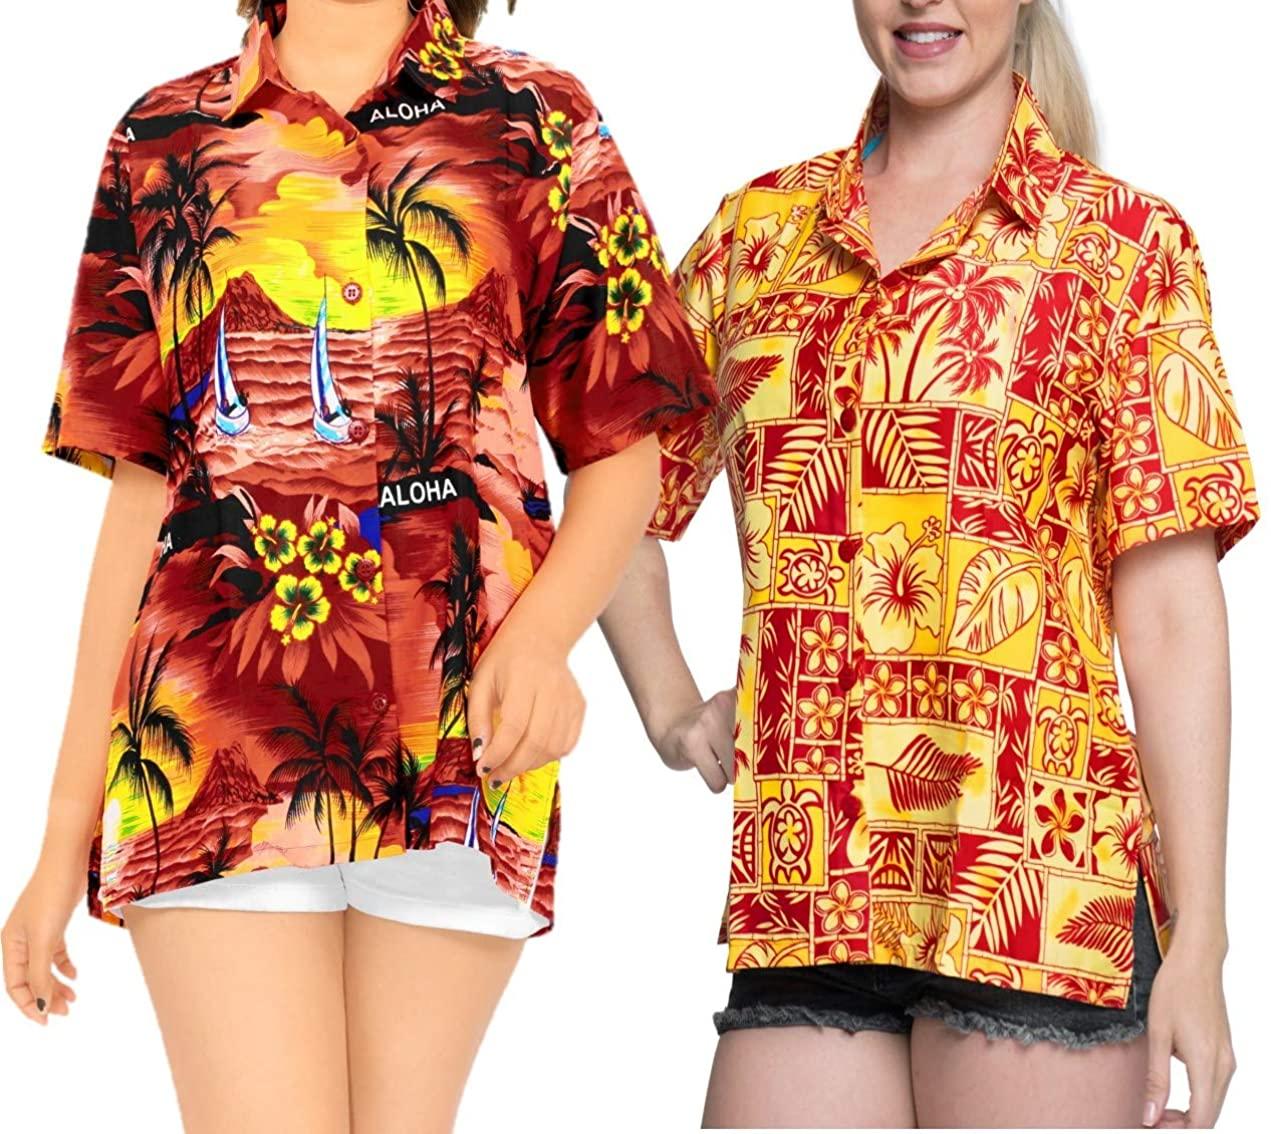 LA LEELA Women's Beach Hawaiian Shirt Dress Casual Button Down Shirts XL Work from Home Clothes Women Blouse Pack of 2